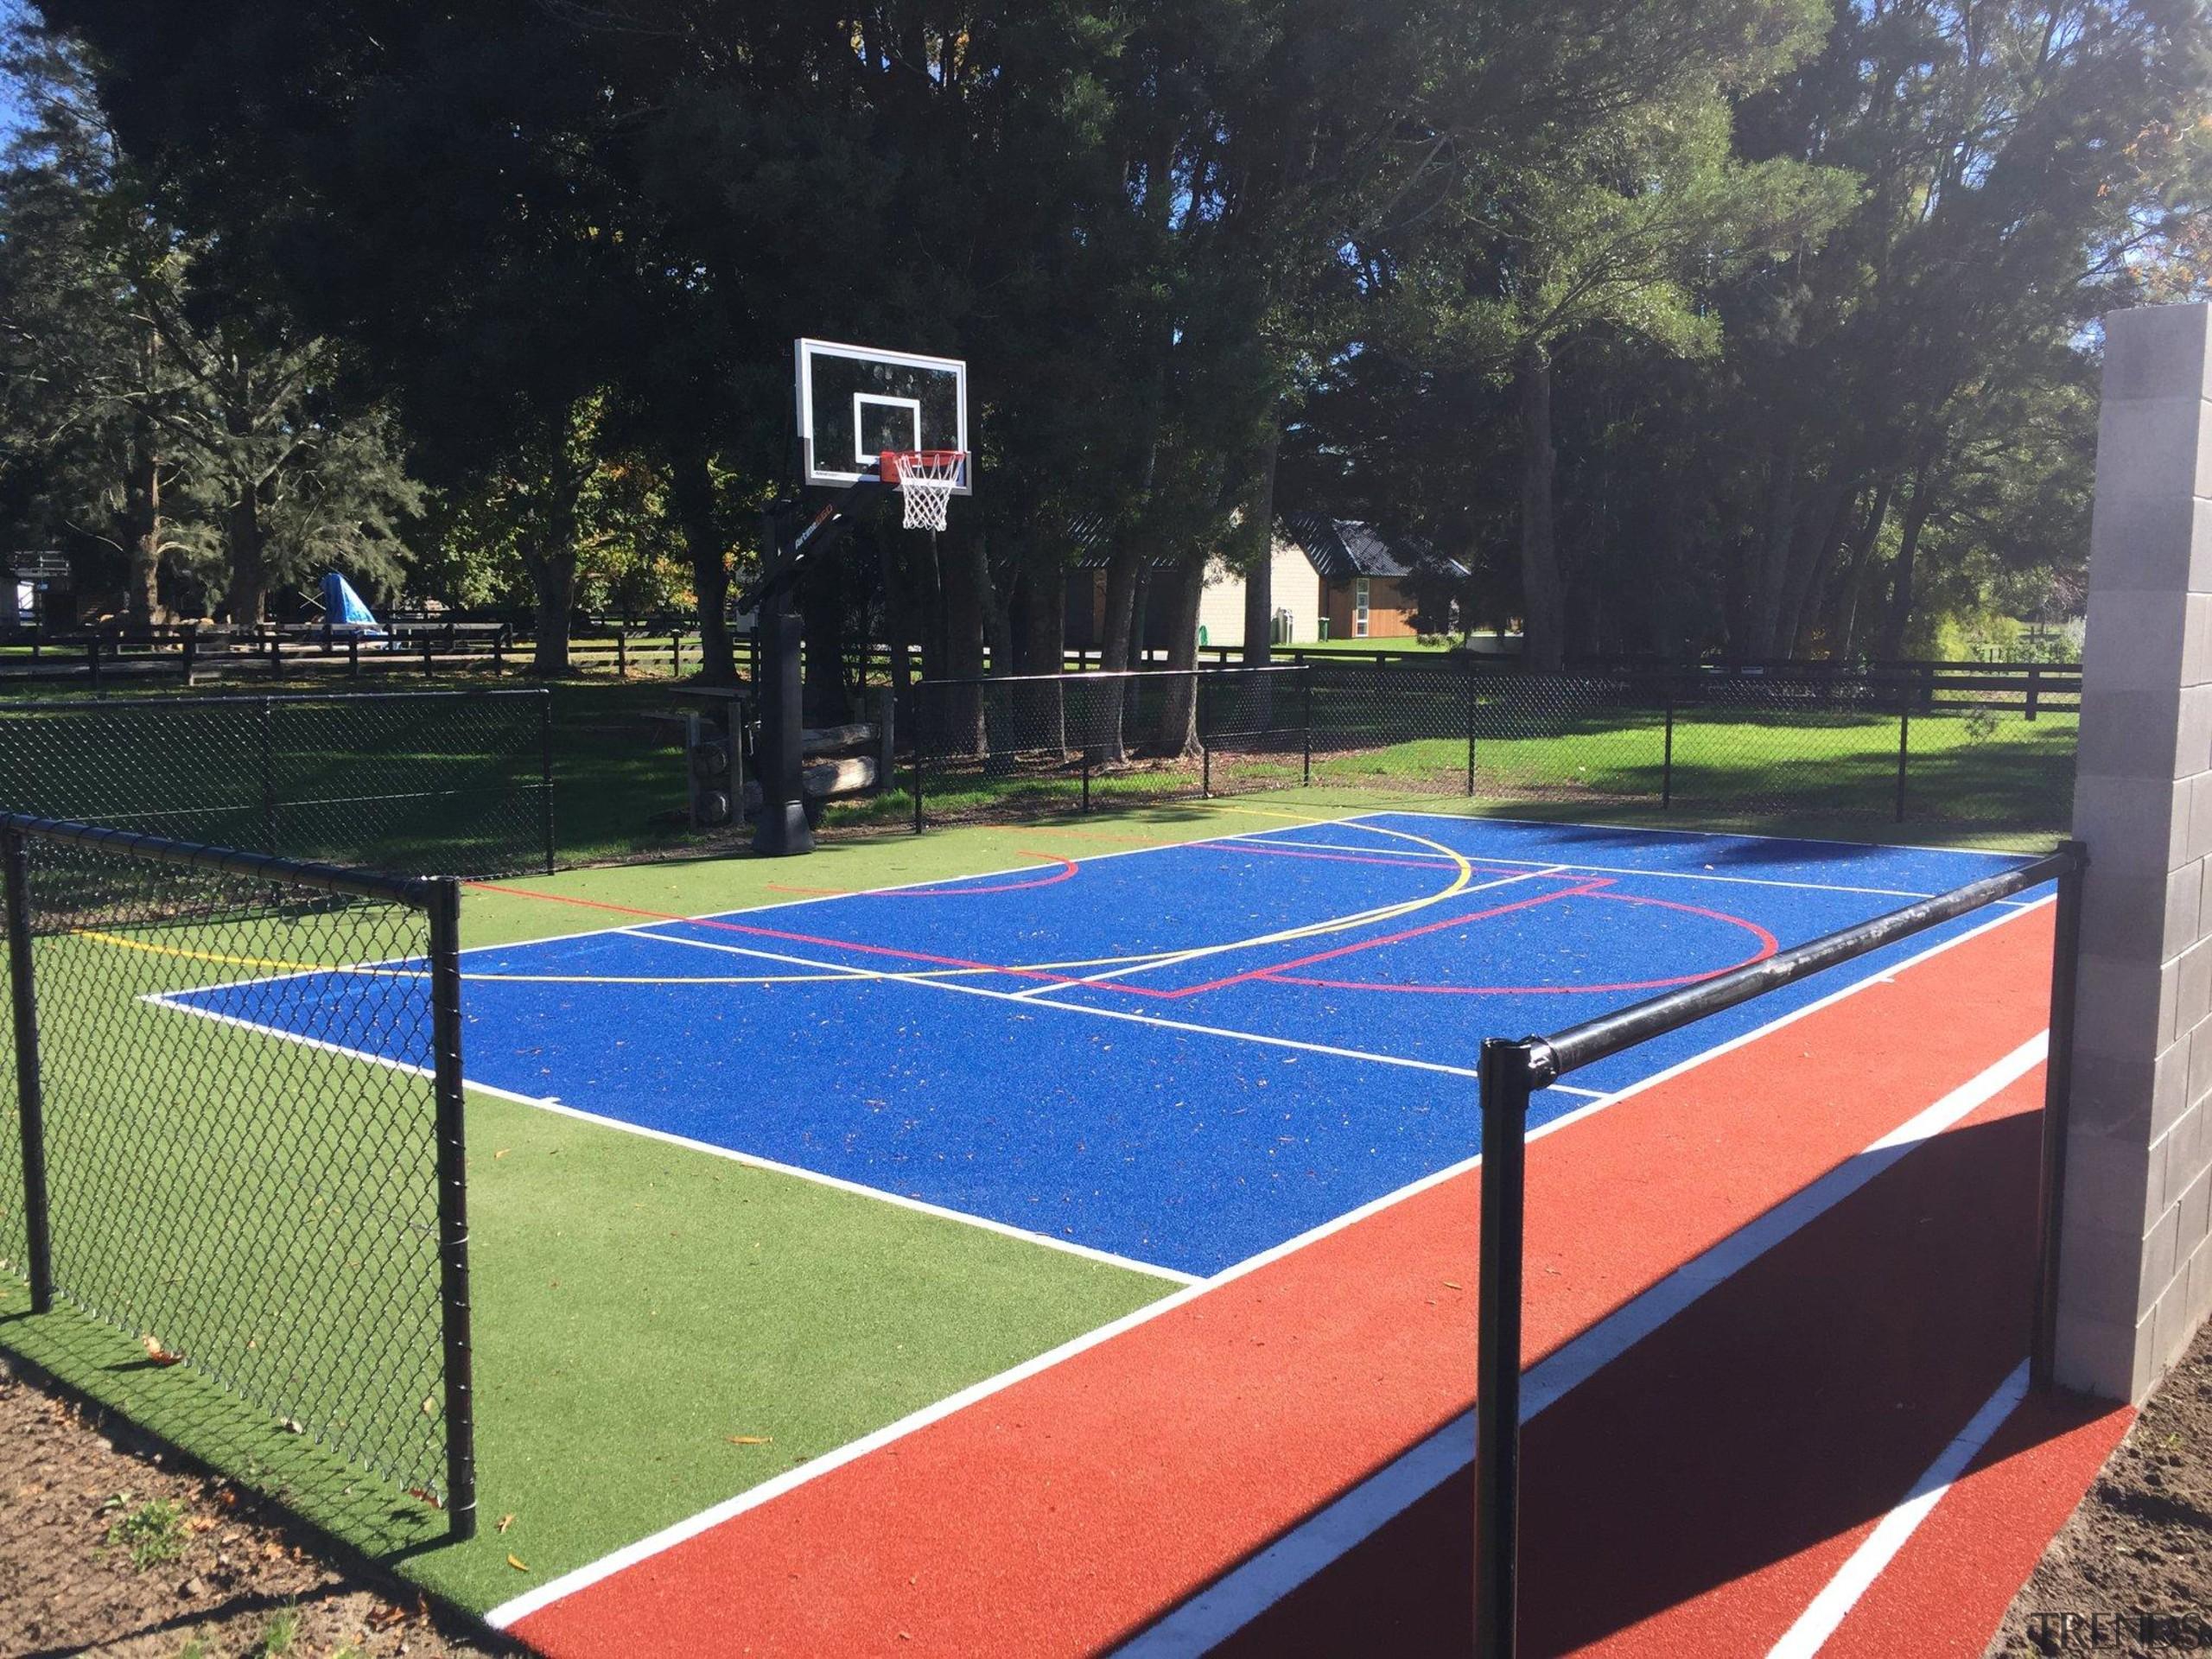 58698484 2251113138314148 6322691231264538624 o - ball game | ball game, grass, net, play, sport venue, sports, tennis court, black